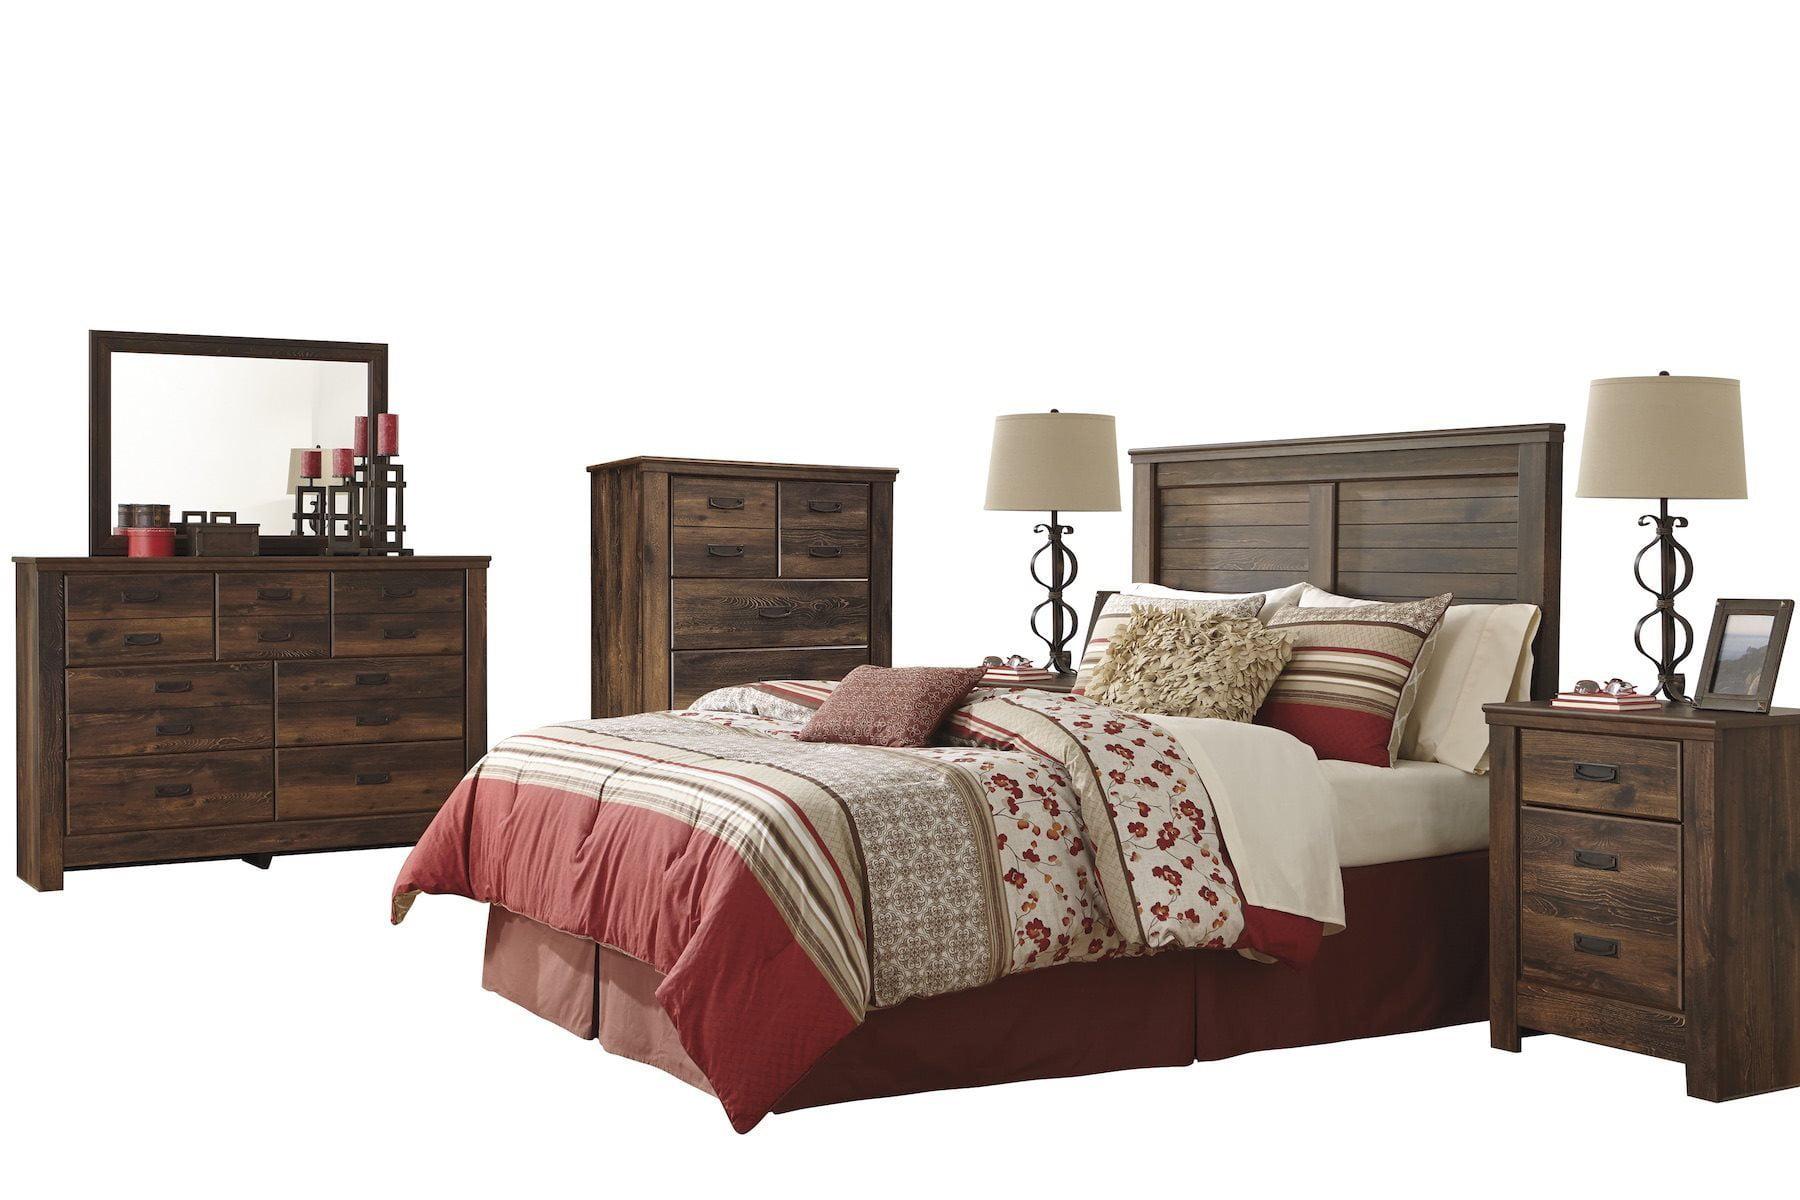 Ashley Furniture Quinden 6 Pc E King Panel Headboard Bedroom Set W 2 Nightstand And Chest Dark Brown Walmart Com Walmart Com